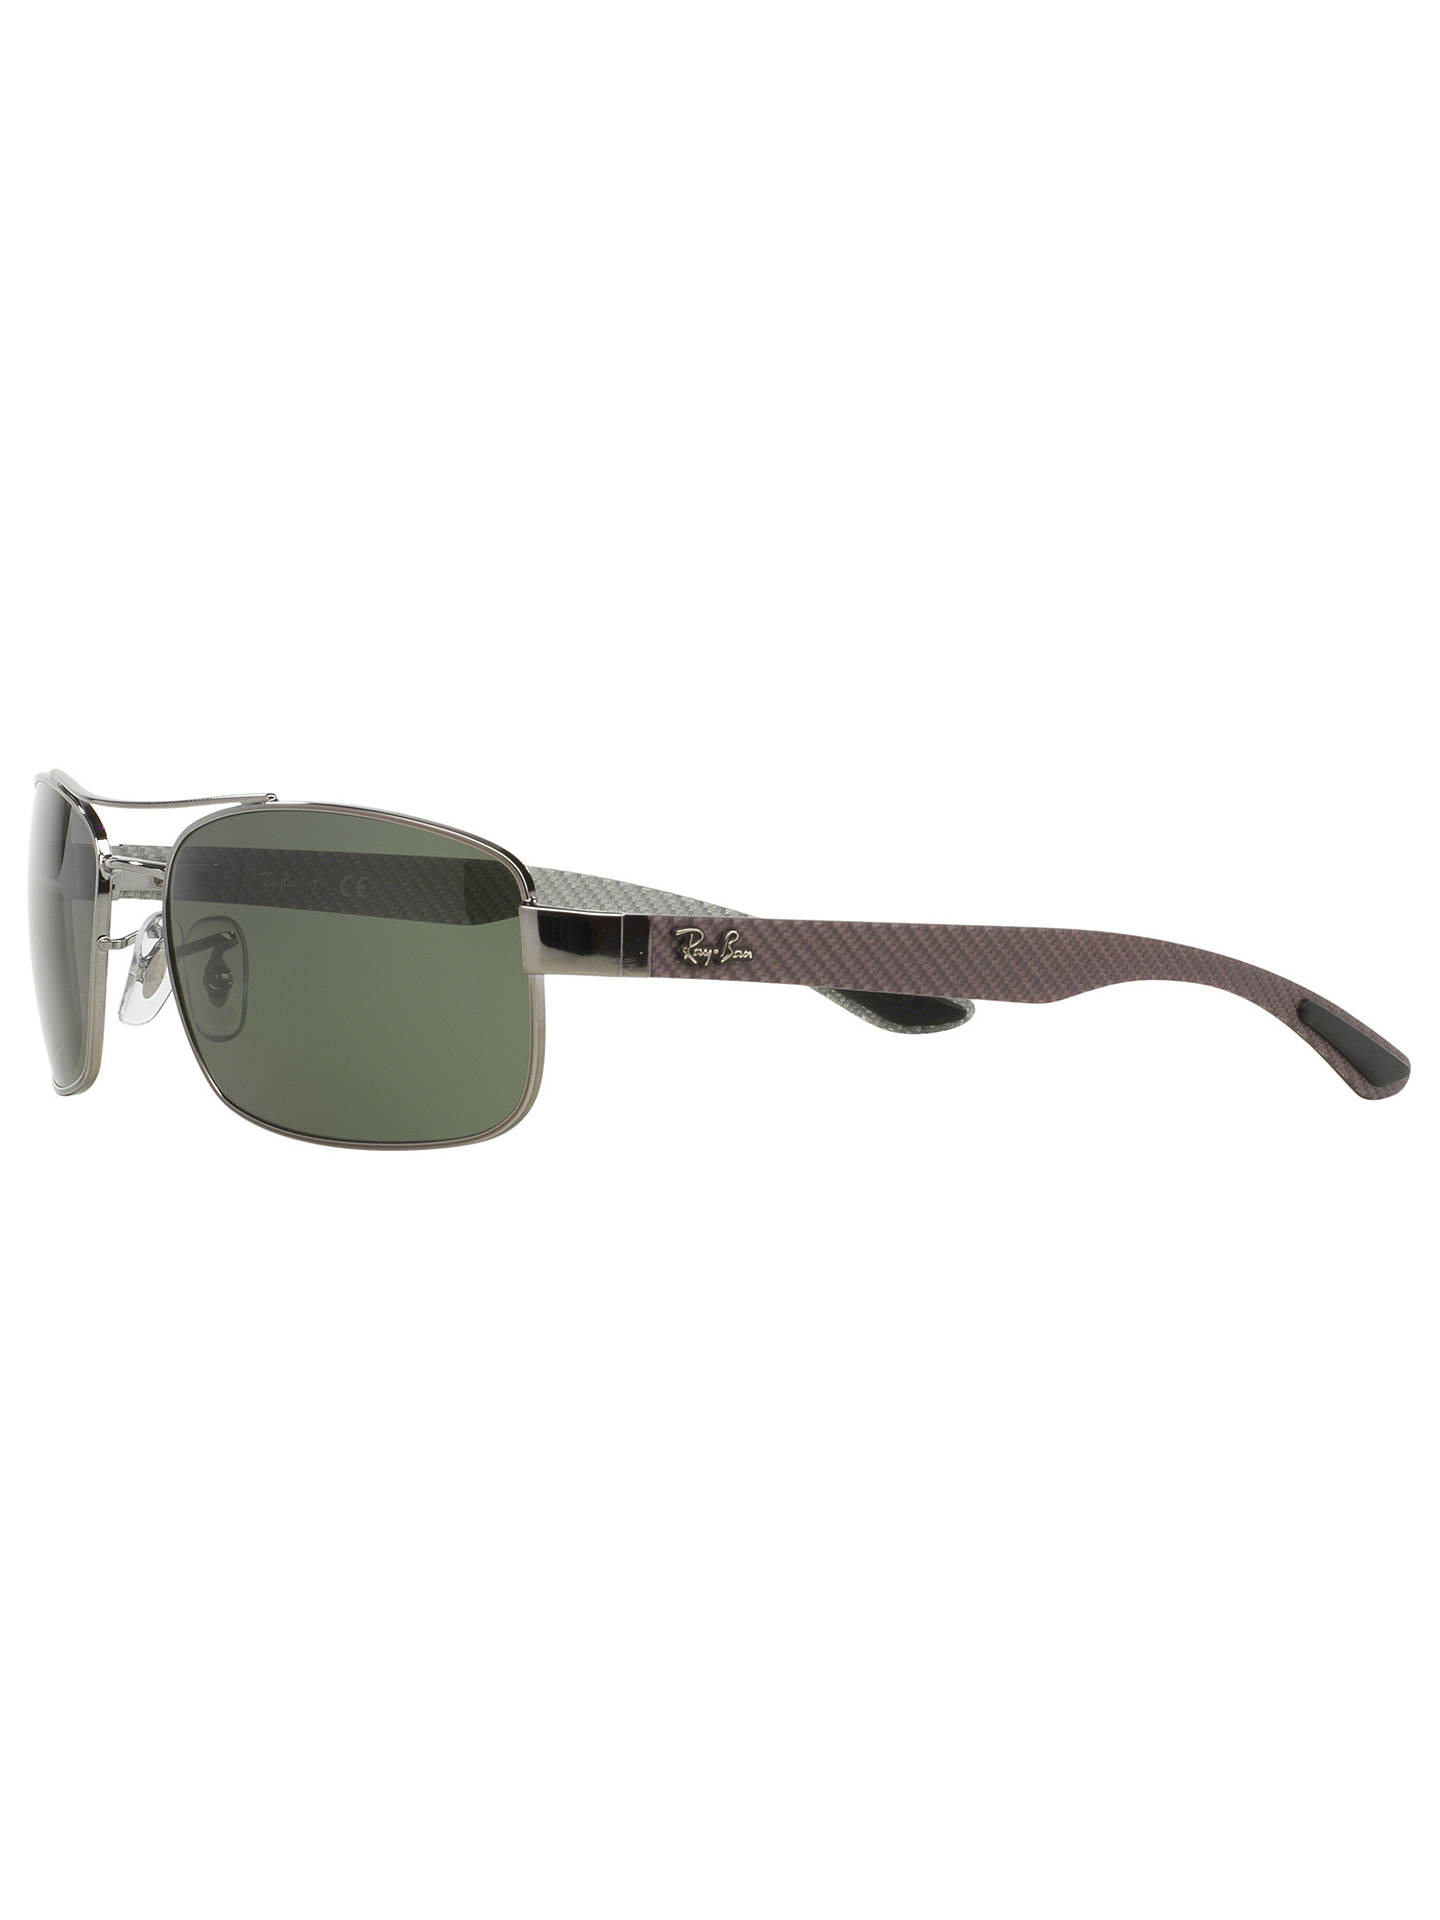 3022f904fc ... BuyRay-Ban RB8316 Tech Carbon Fibre Rectangular Sunglasses